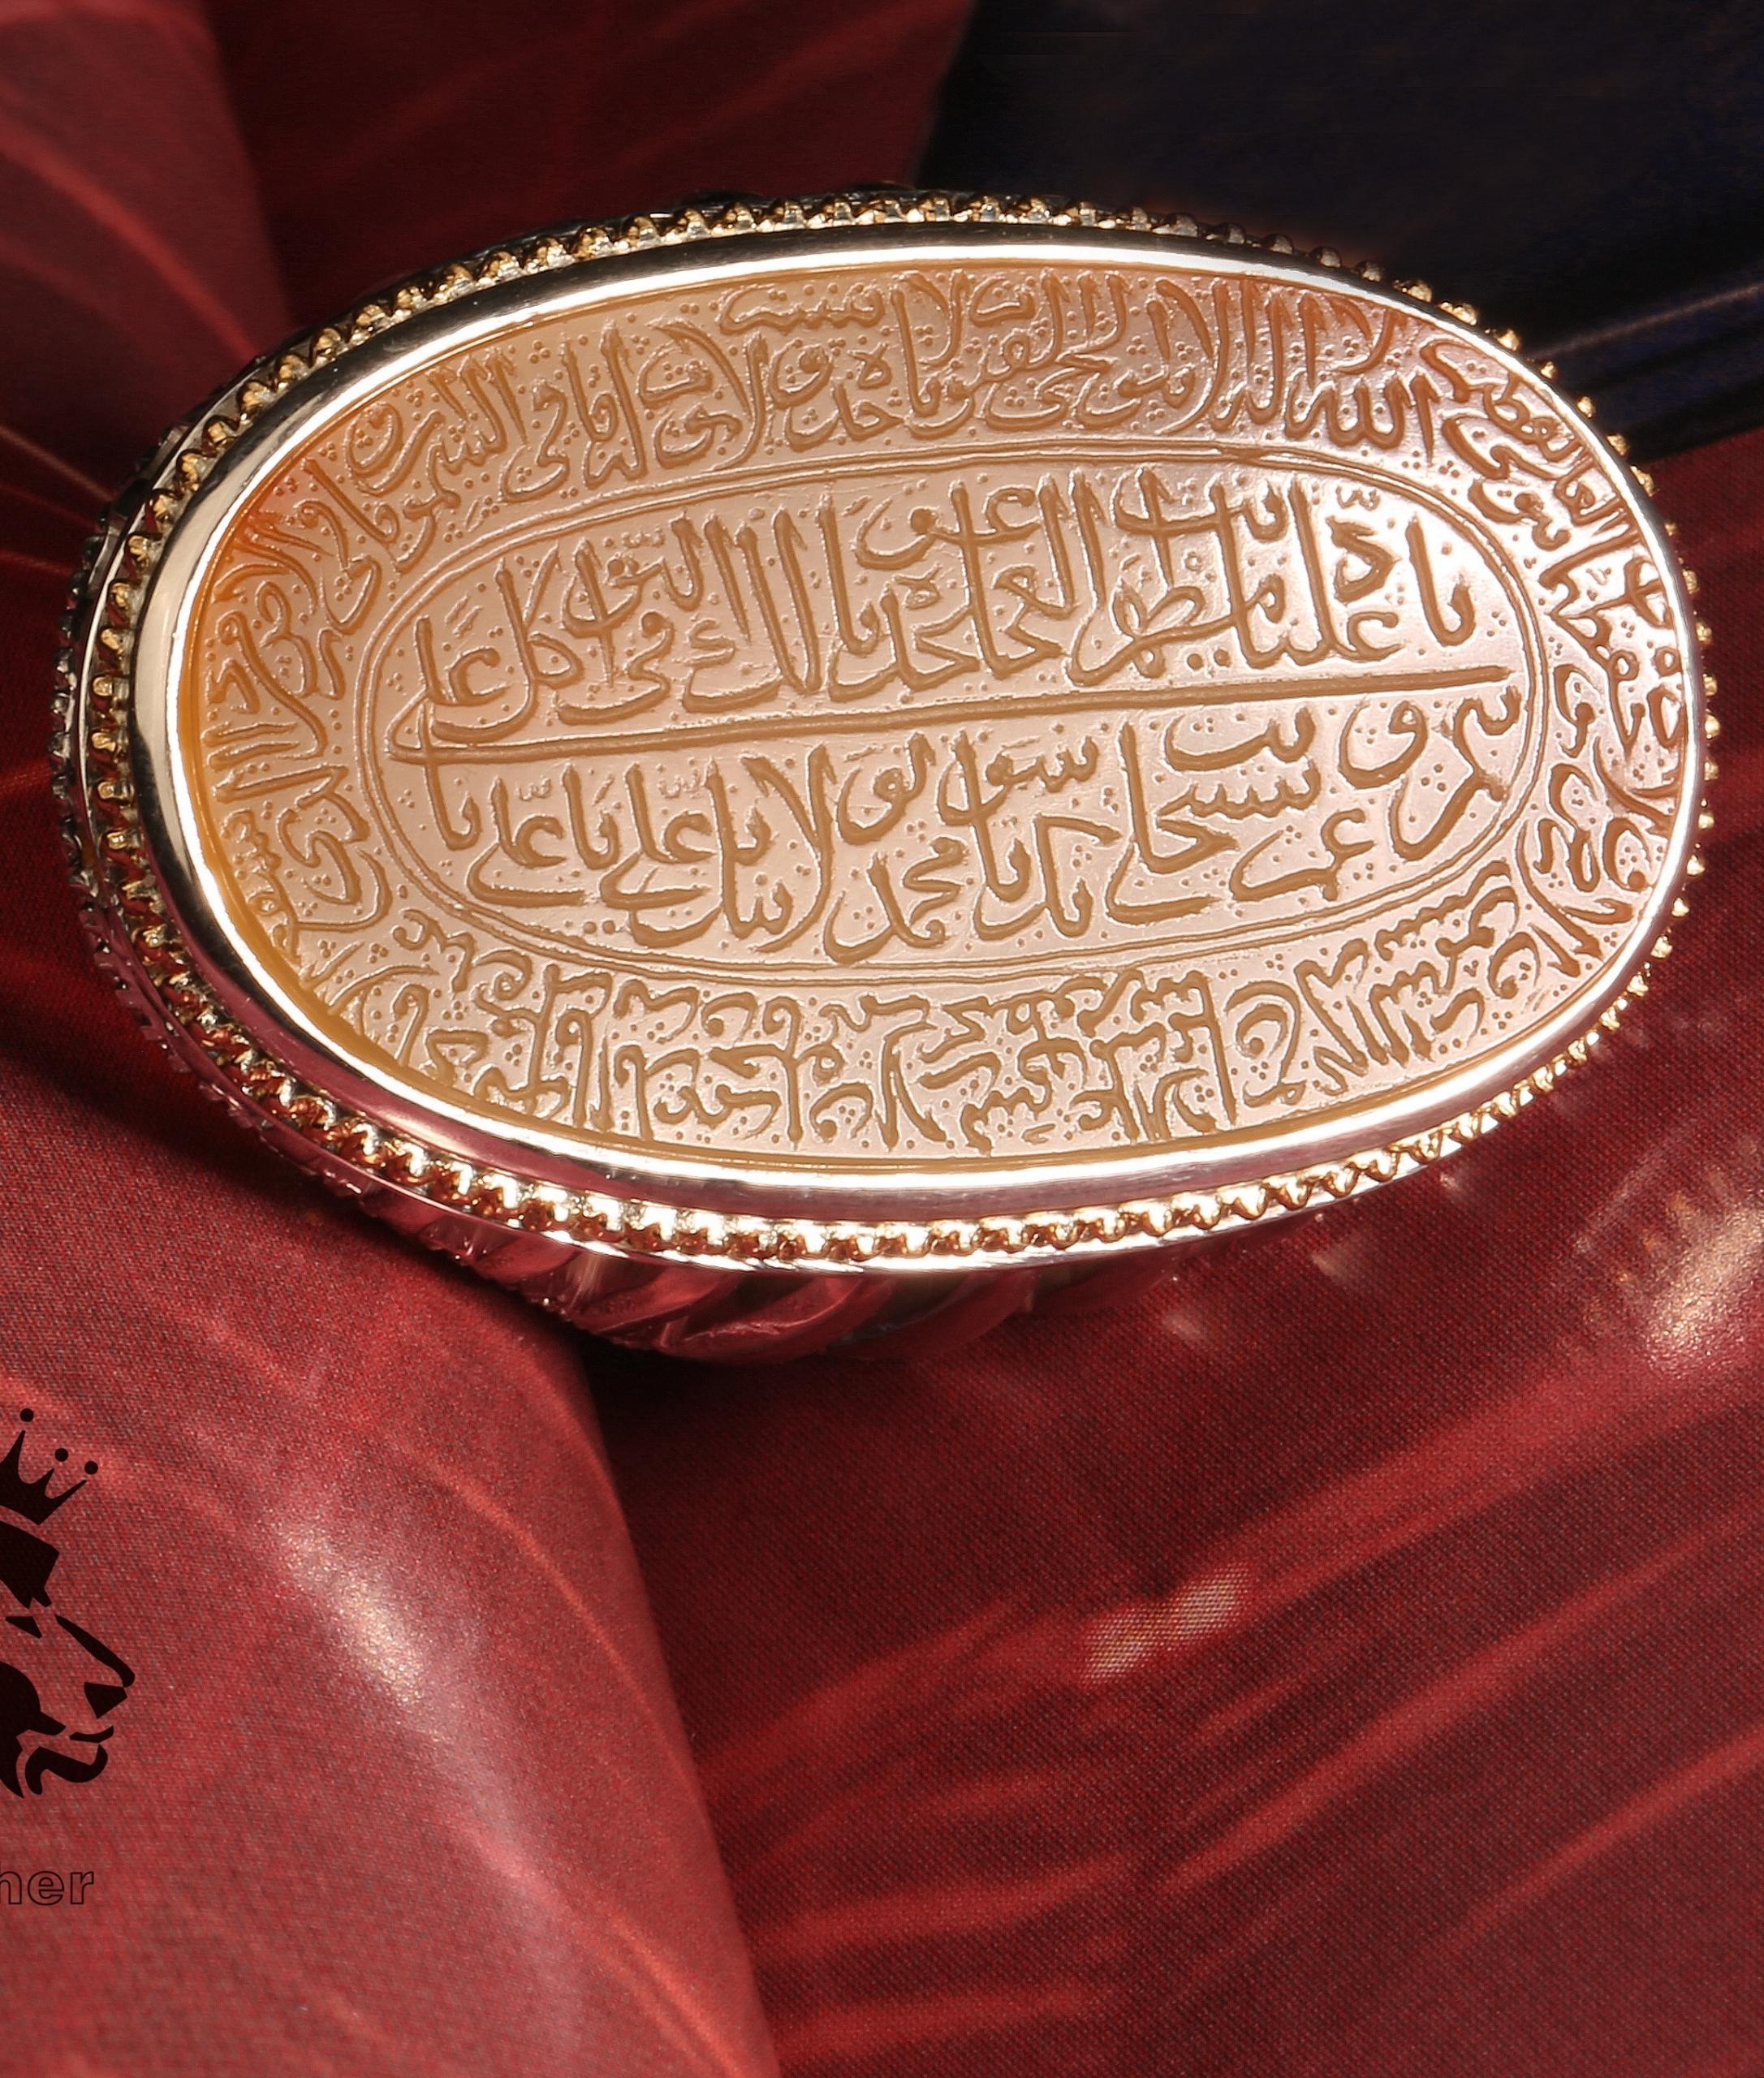 A-1408 انگشتر کوپال کهنه عقیق یمنی و پایه فدیوم ستونی